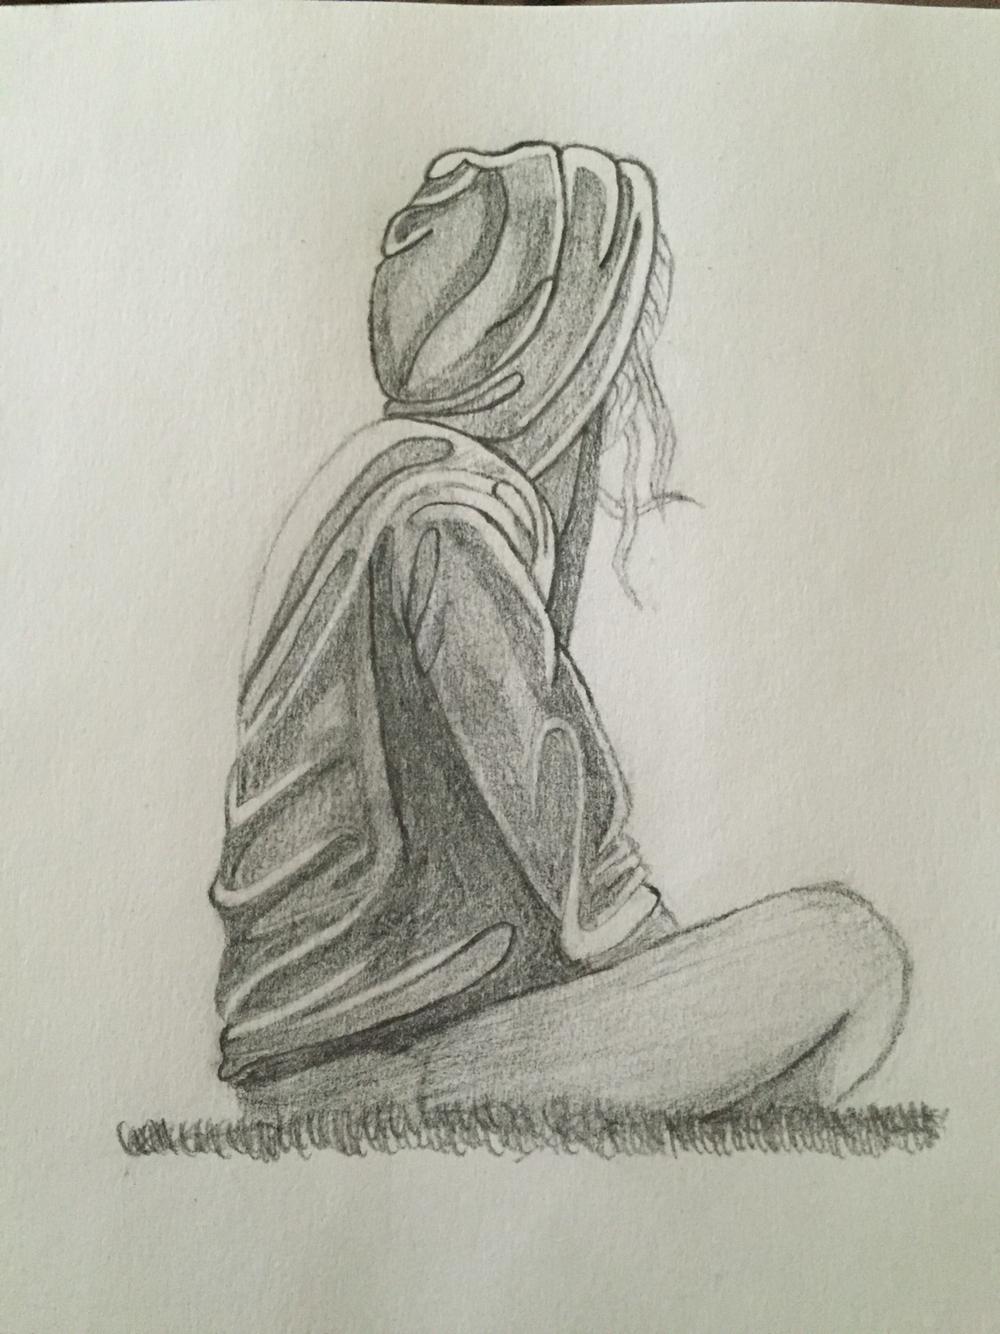 1000x1334 Easy Creative Pencil Drawings Easy Pencil Sketches Of A Couple Sad